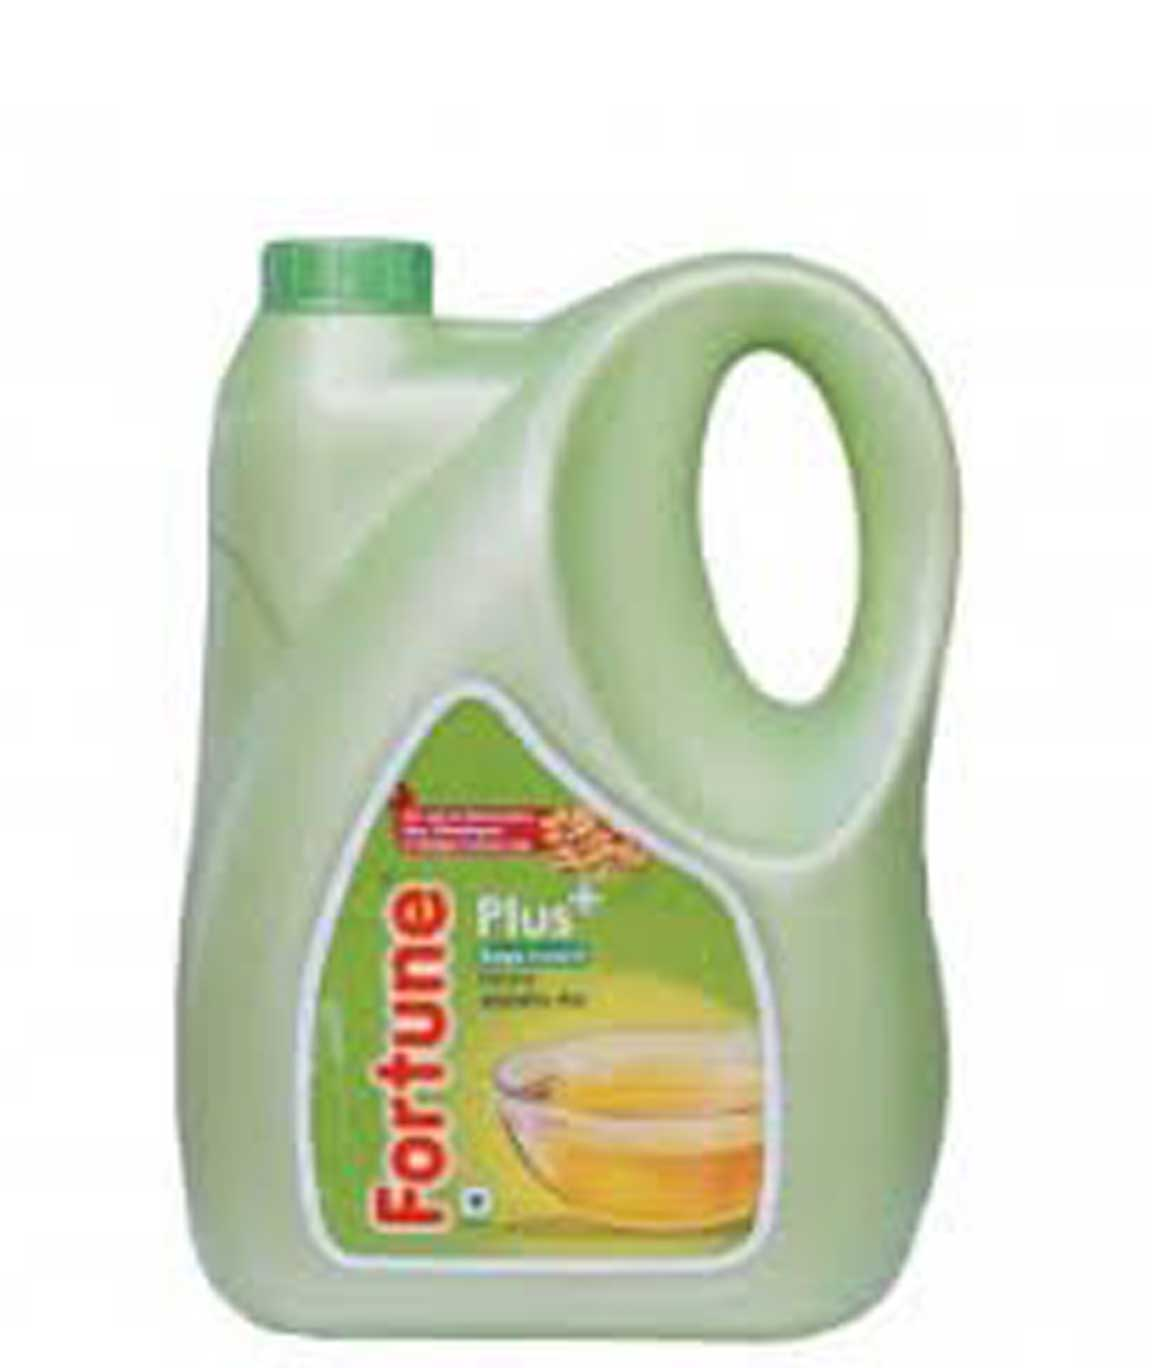 Fortune Plus Refind Soyabean Oil 5 Lit.